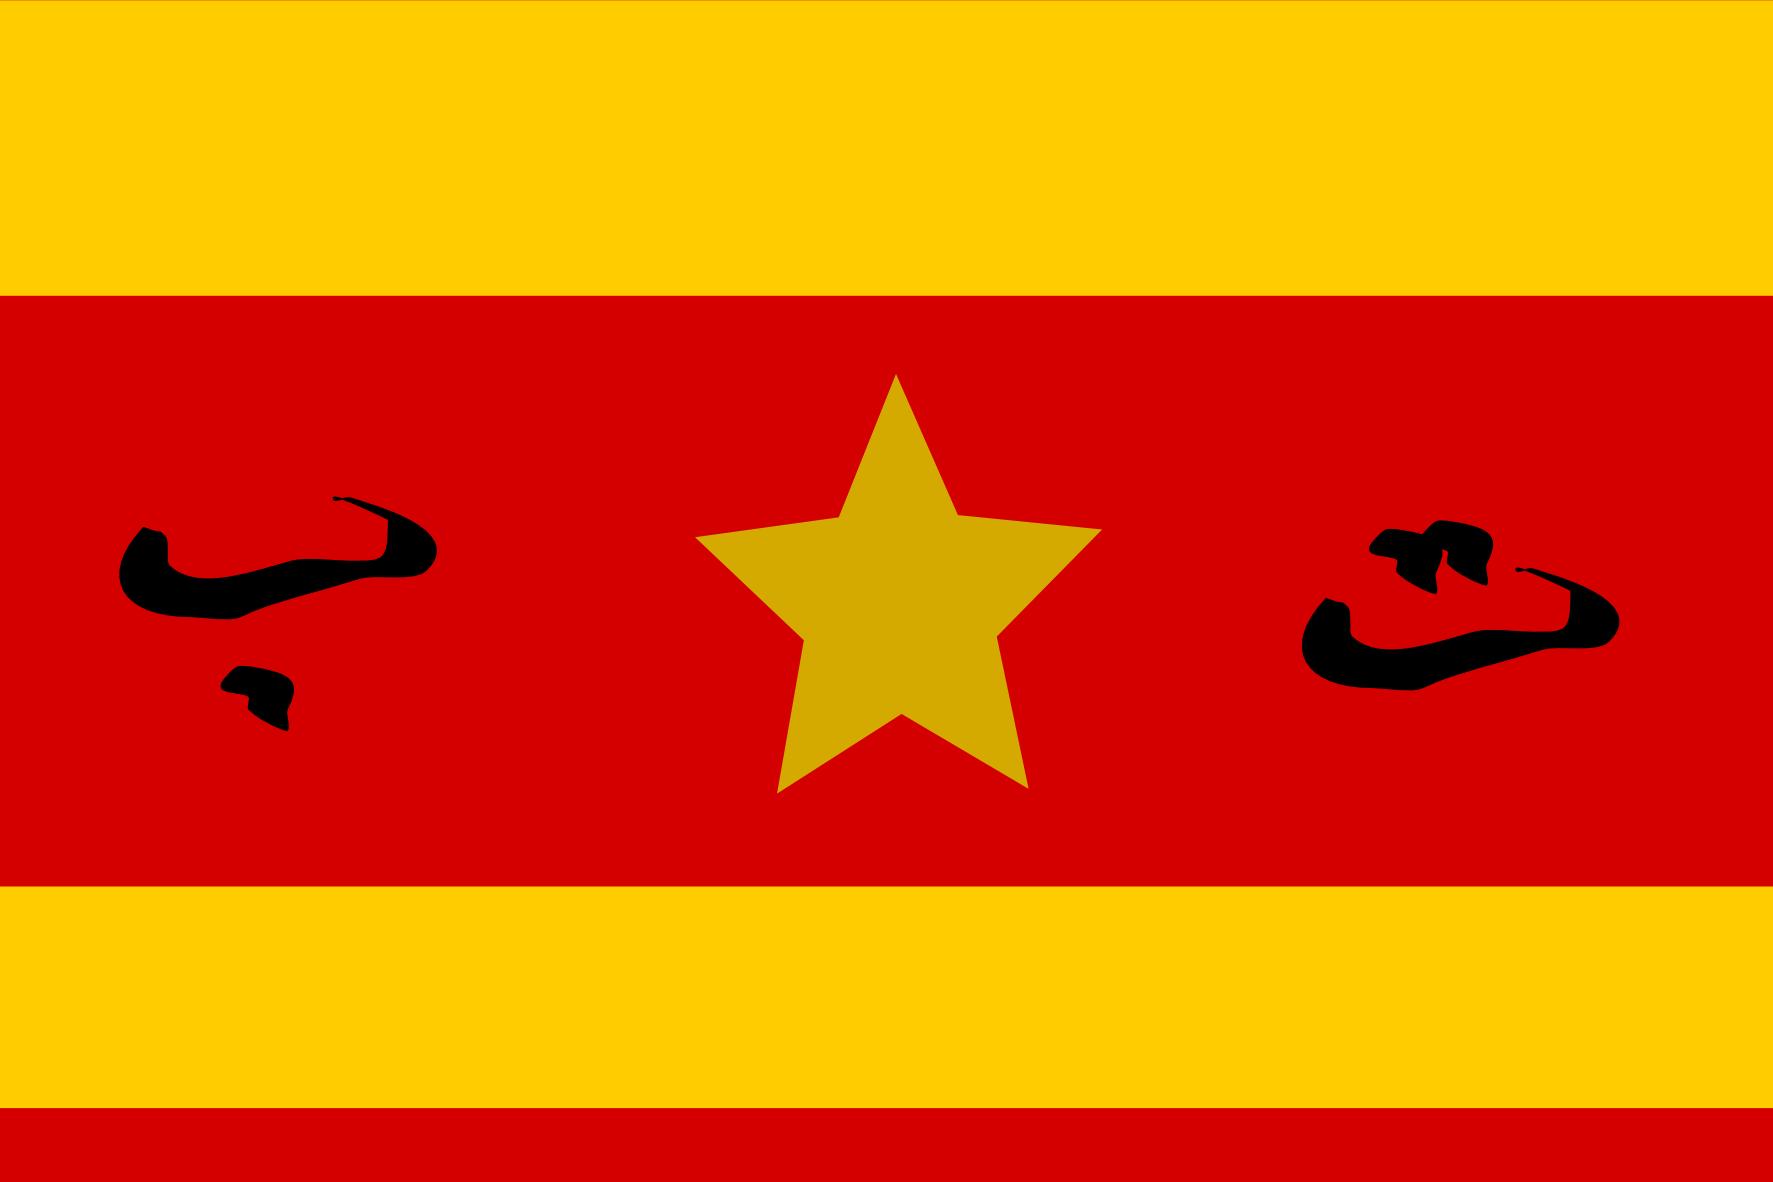 Bati-Turkestan (1983: Doomsday)